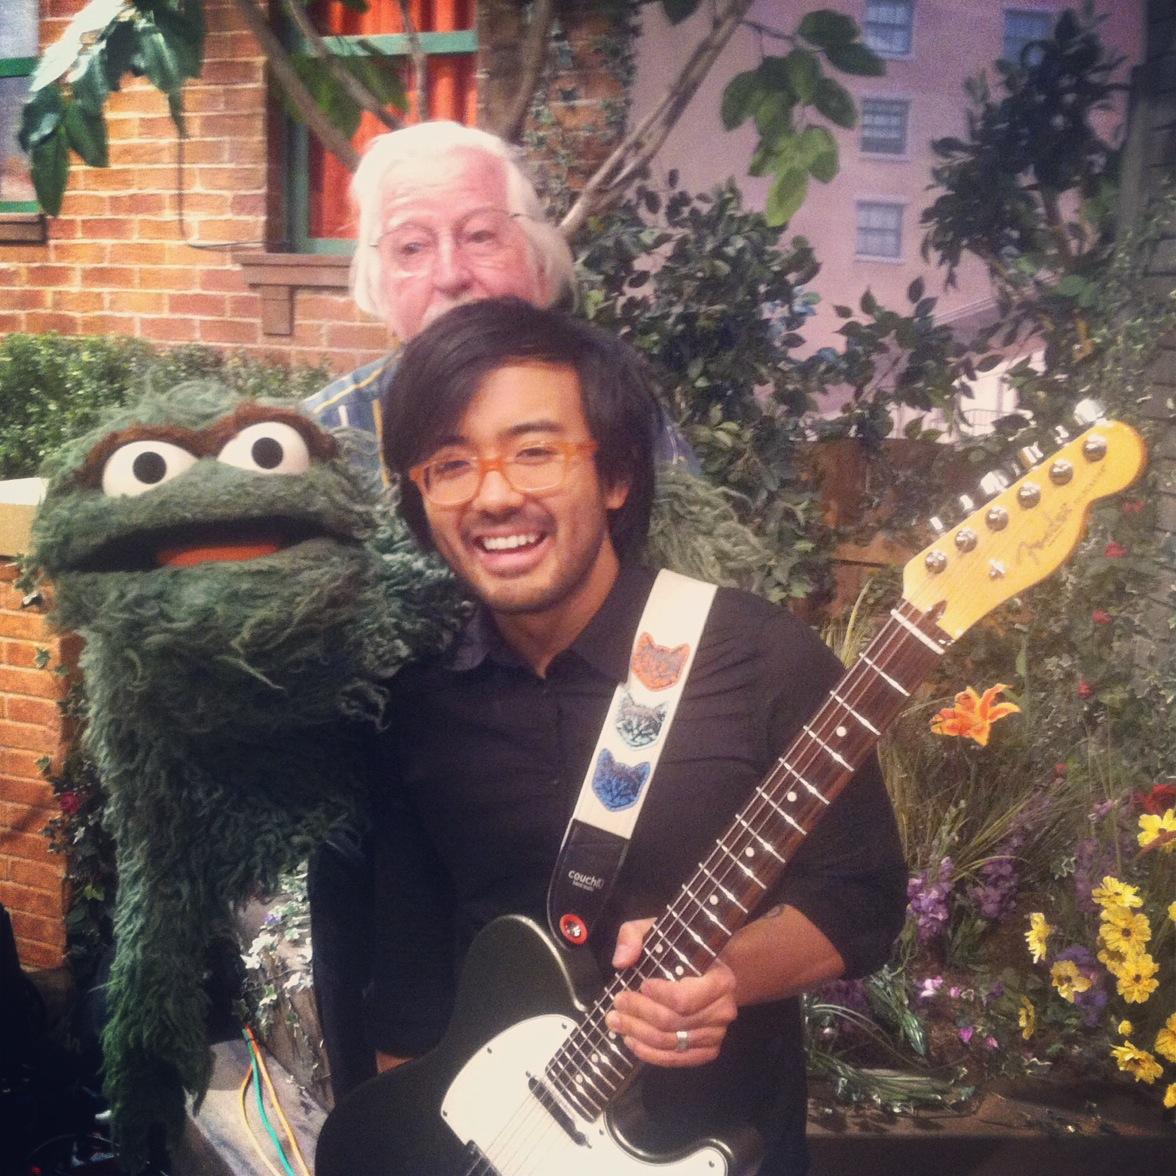 A Great Big World on Sesame Street! September 11, 2014.